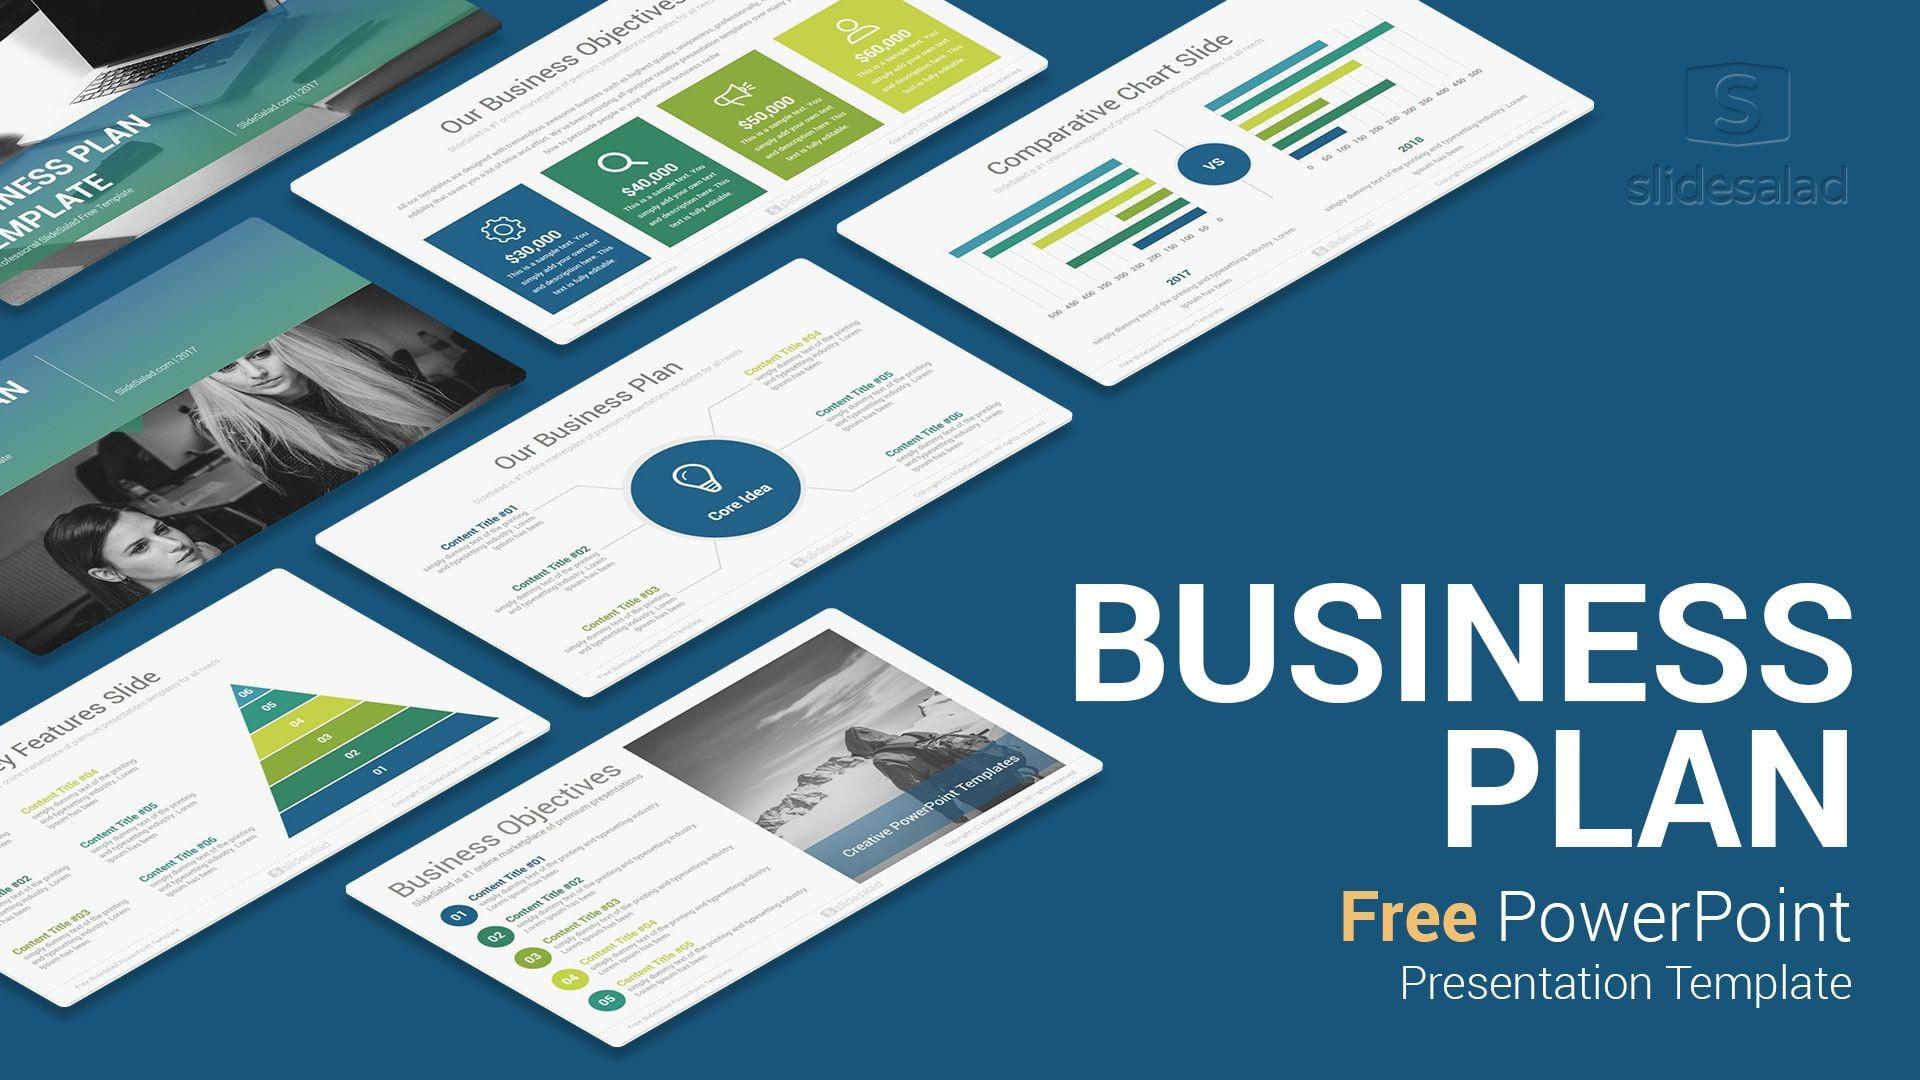 006 Marvelou Free Download Busines Proposal Template Ppt Highest Clarity  Best Plan Sample Plan.ppt 20201920